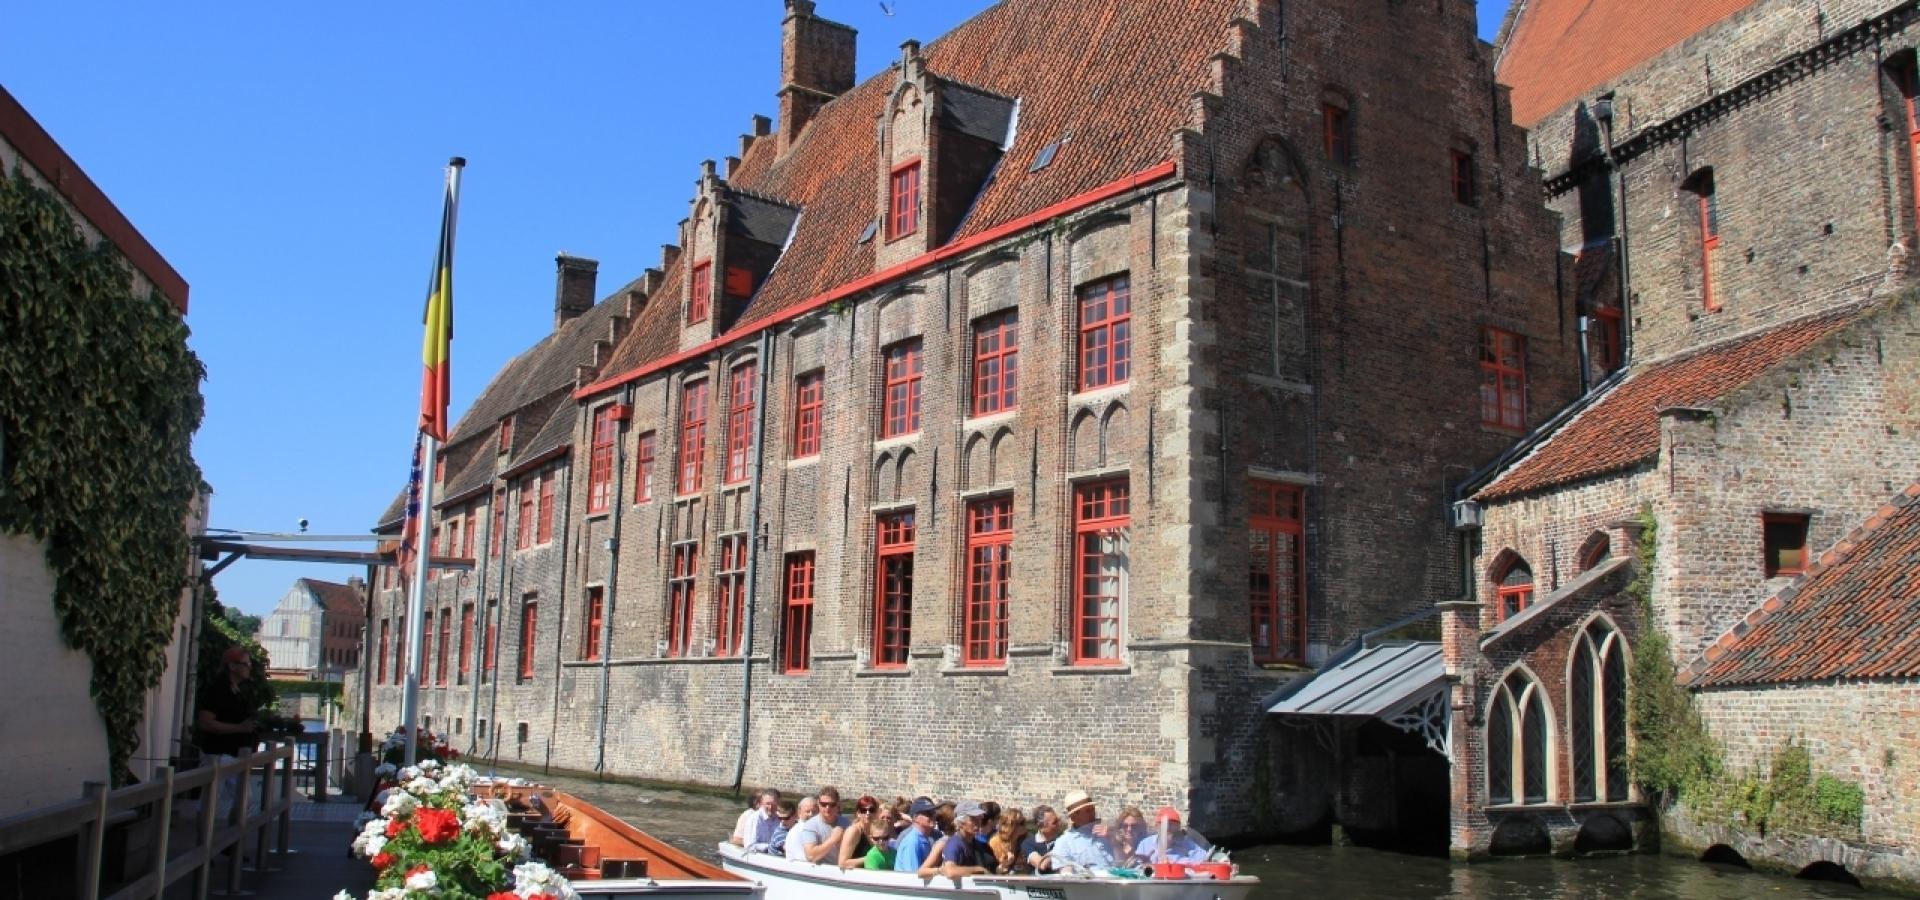 Belgica - Escapada a Brujas